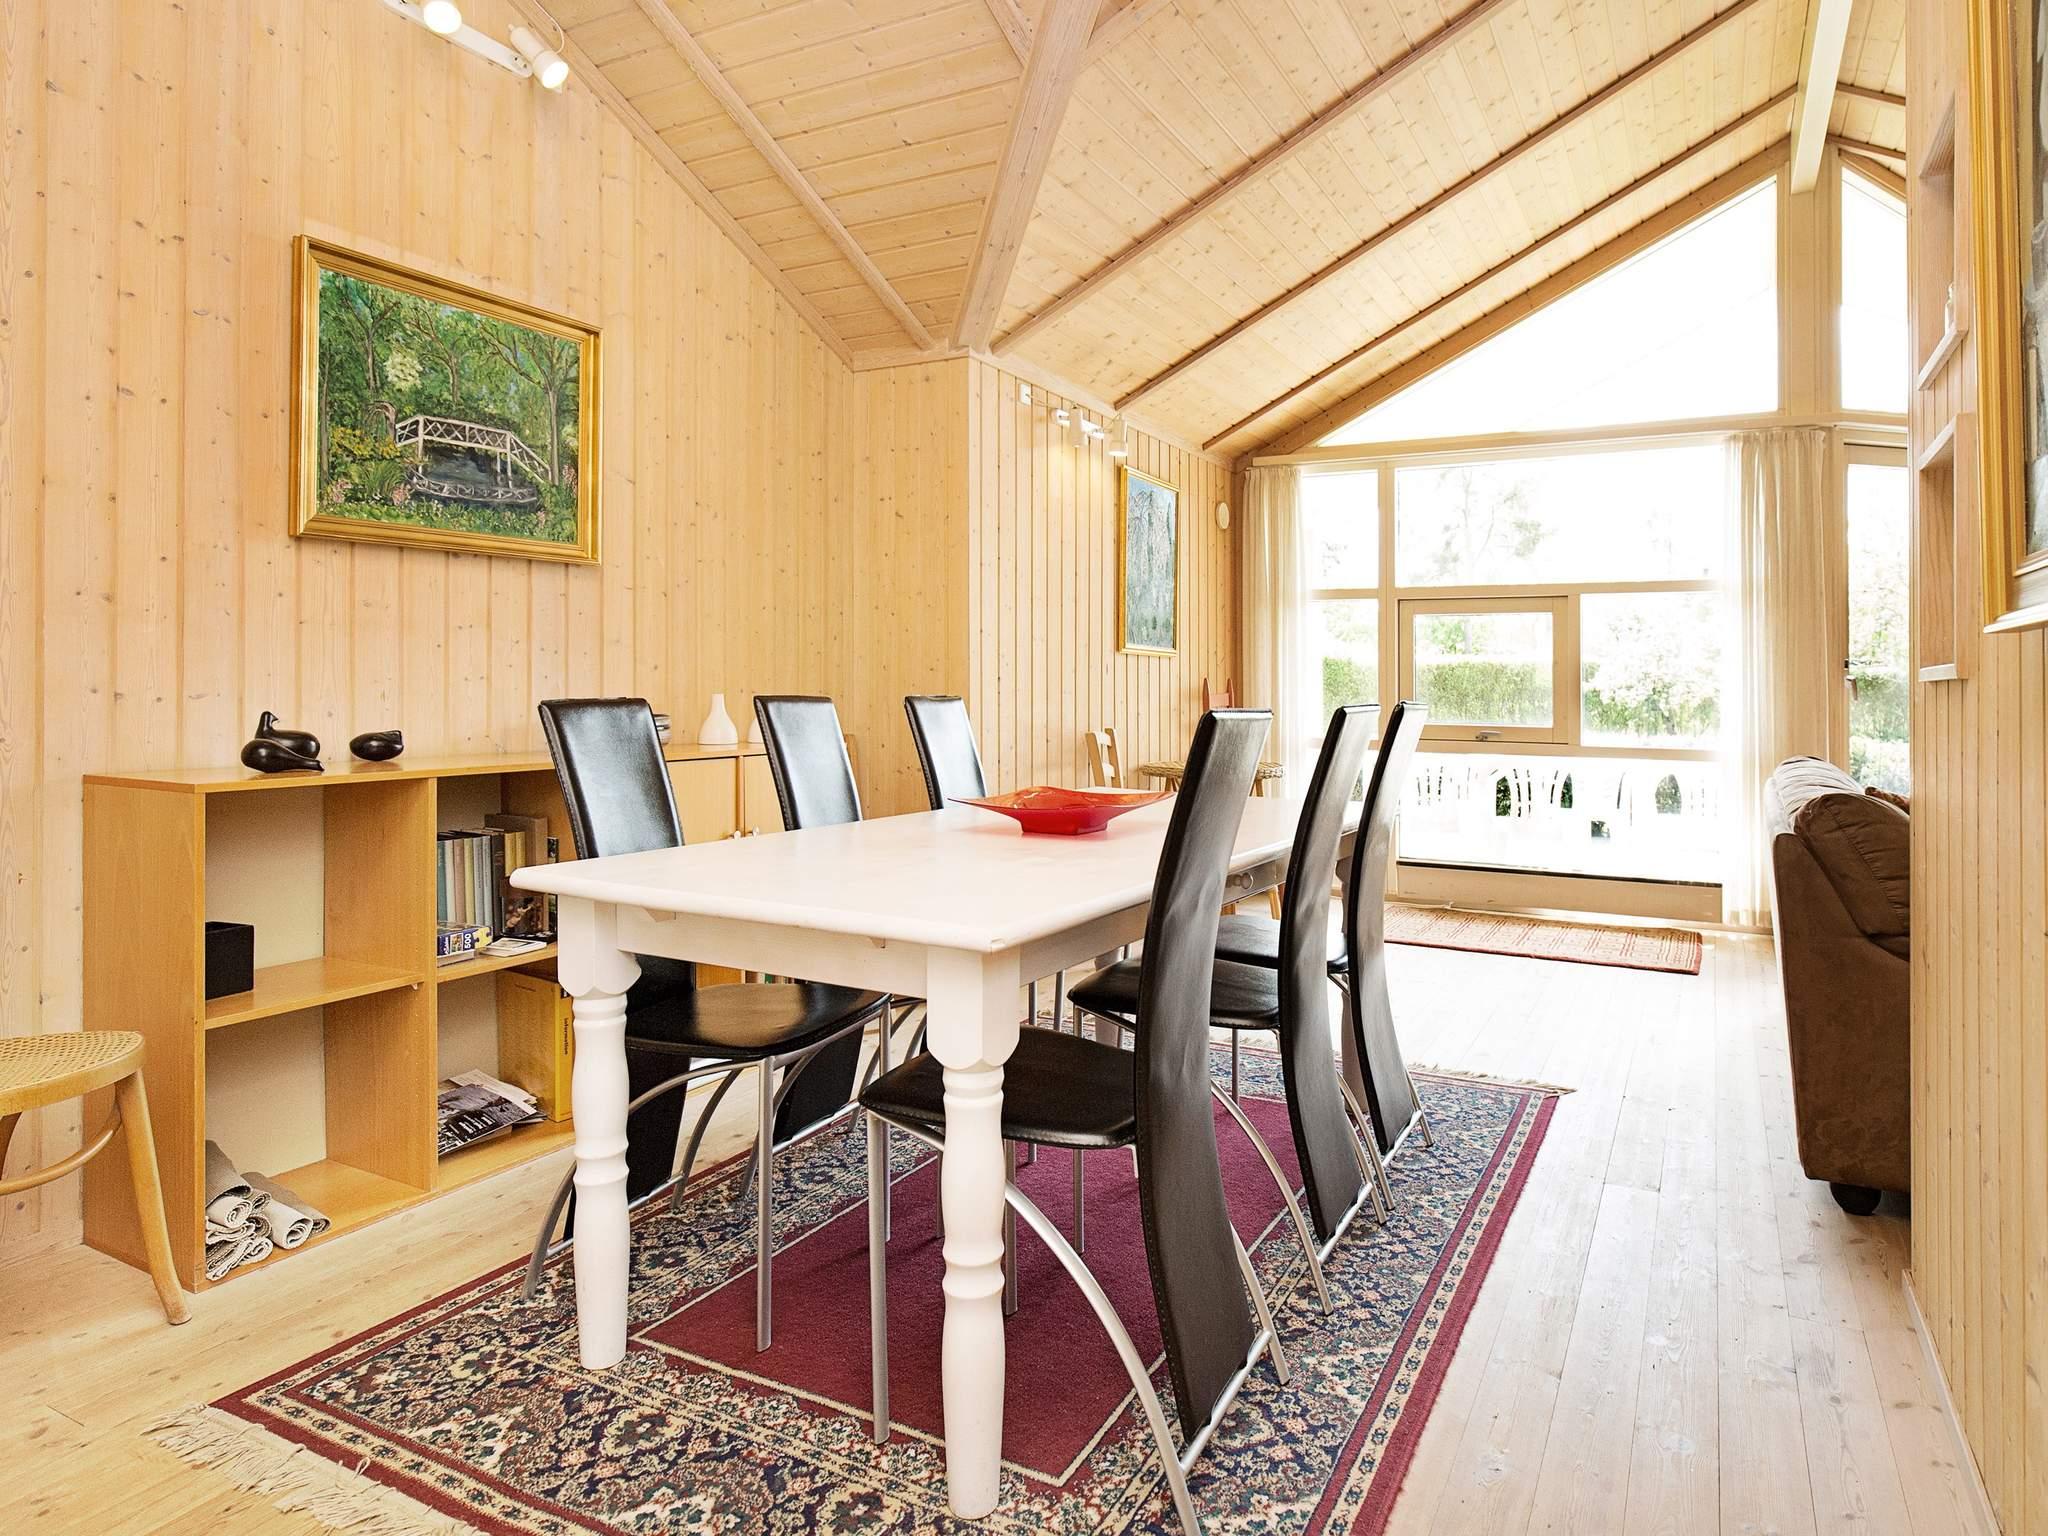 Ferienhaus Hornbæk (87412), Hornbæk, , Nordseeland, Dänemark, Bild 7